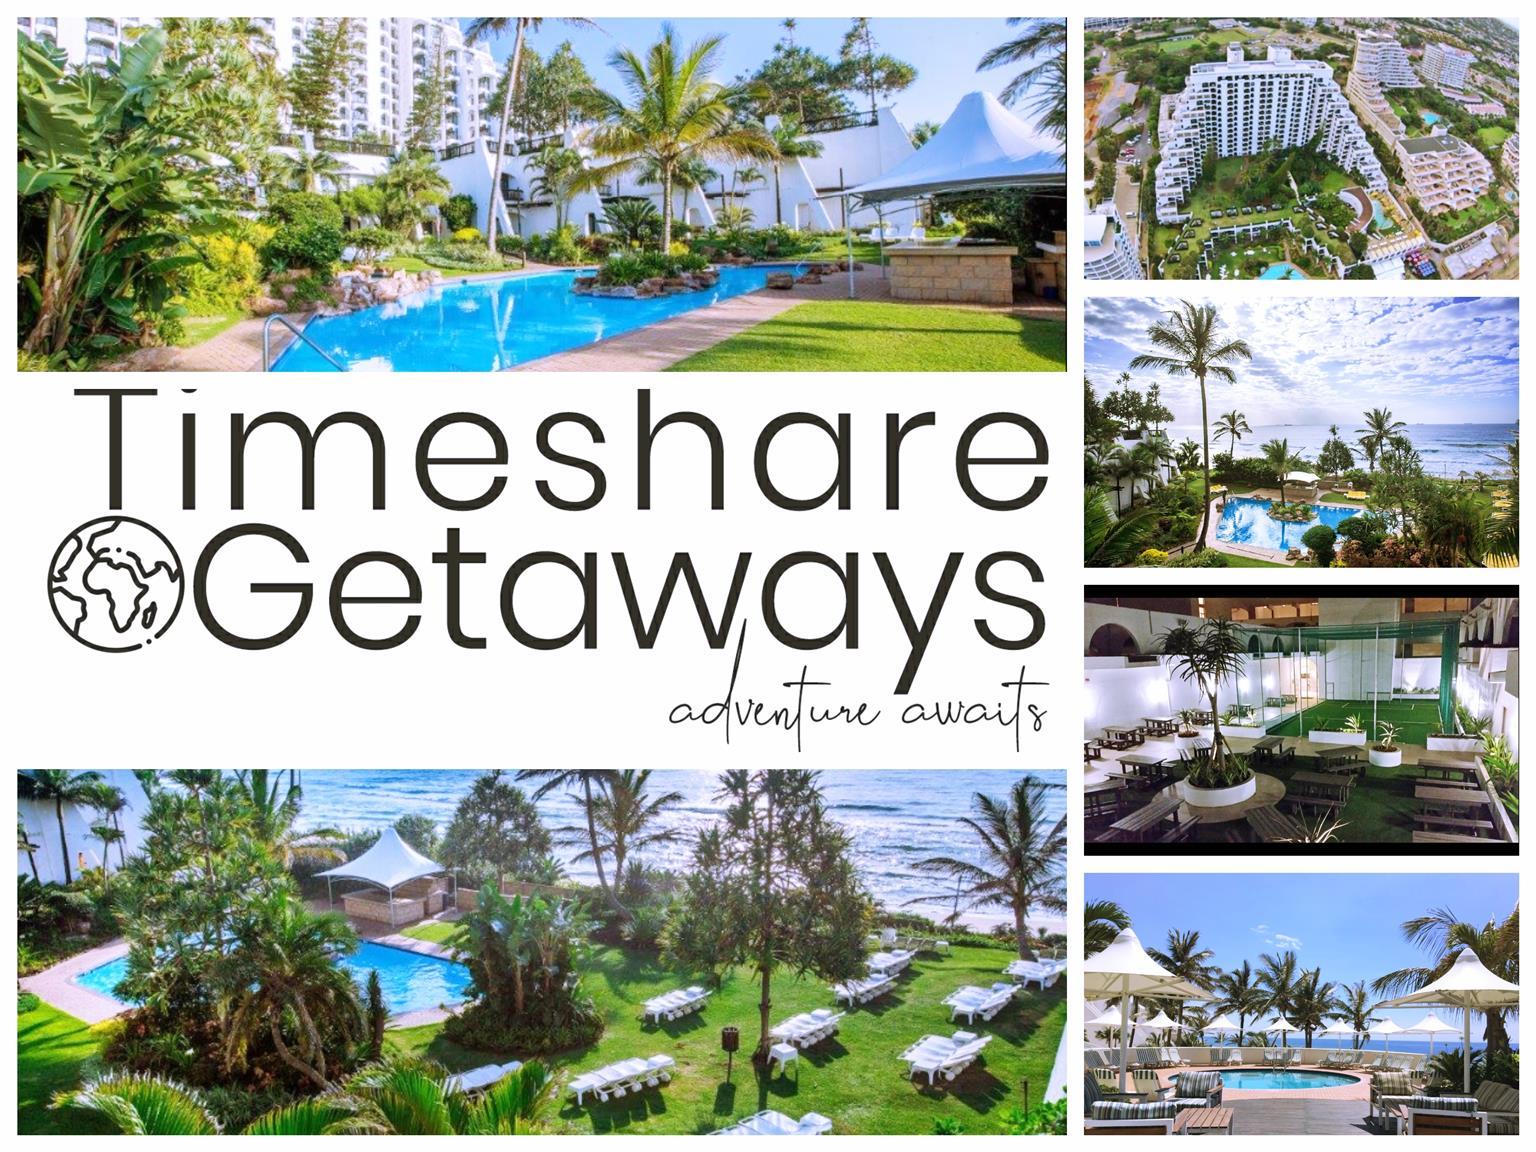 Cabana Beach March Getaways **REDUCED TO GO**